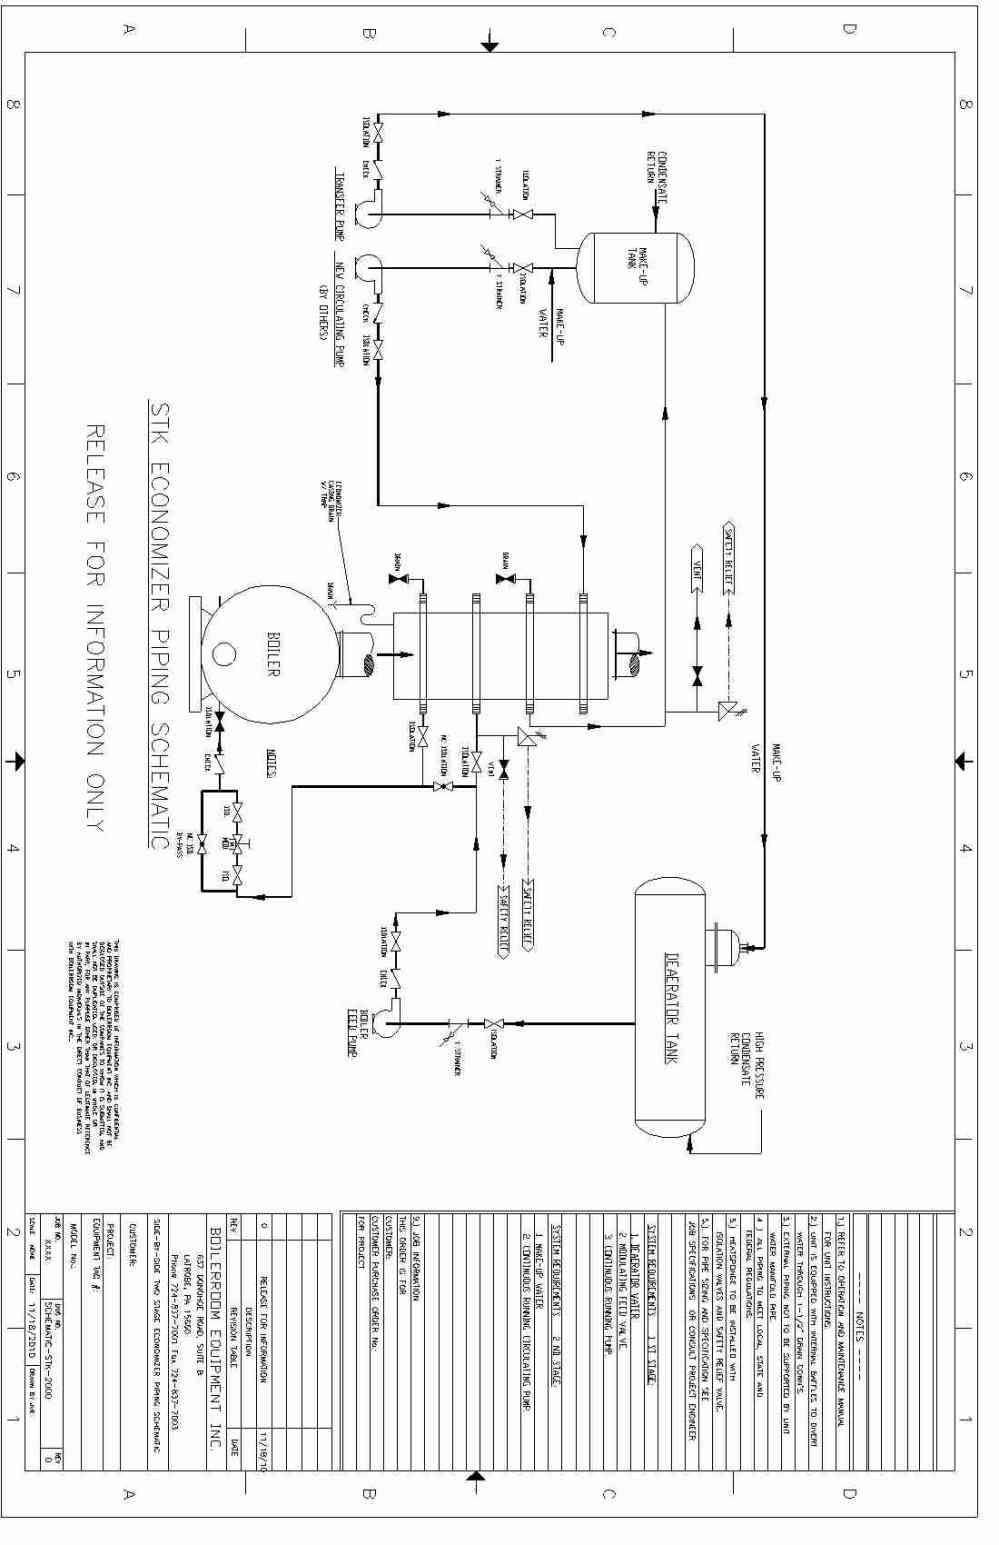 medium resolution of warn xd9000i wiring diagram free download schematic warn warn winch motor wiring diagram warn winch 2500